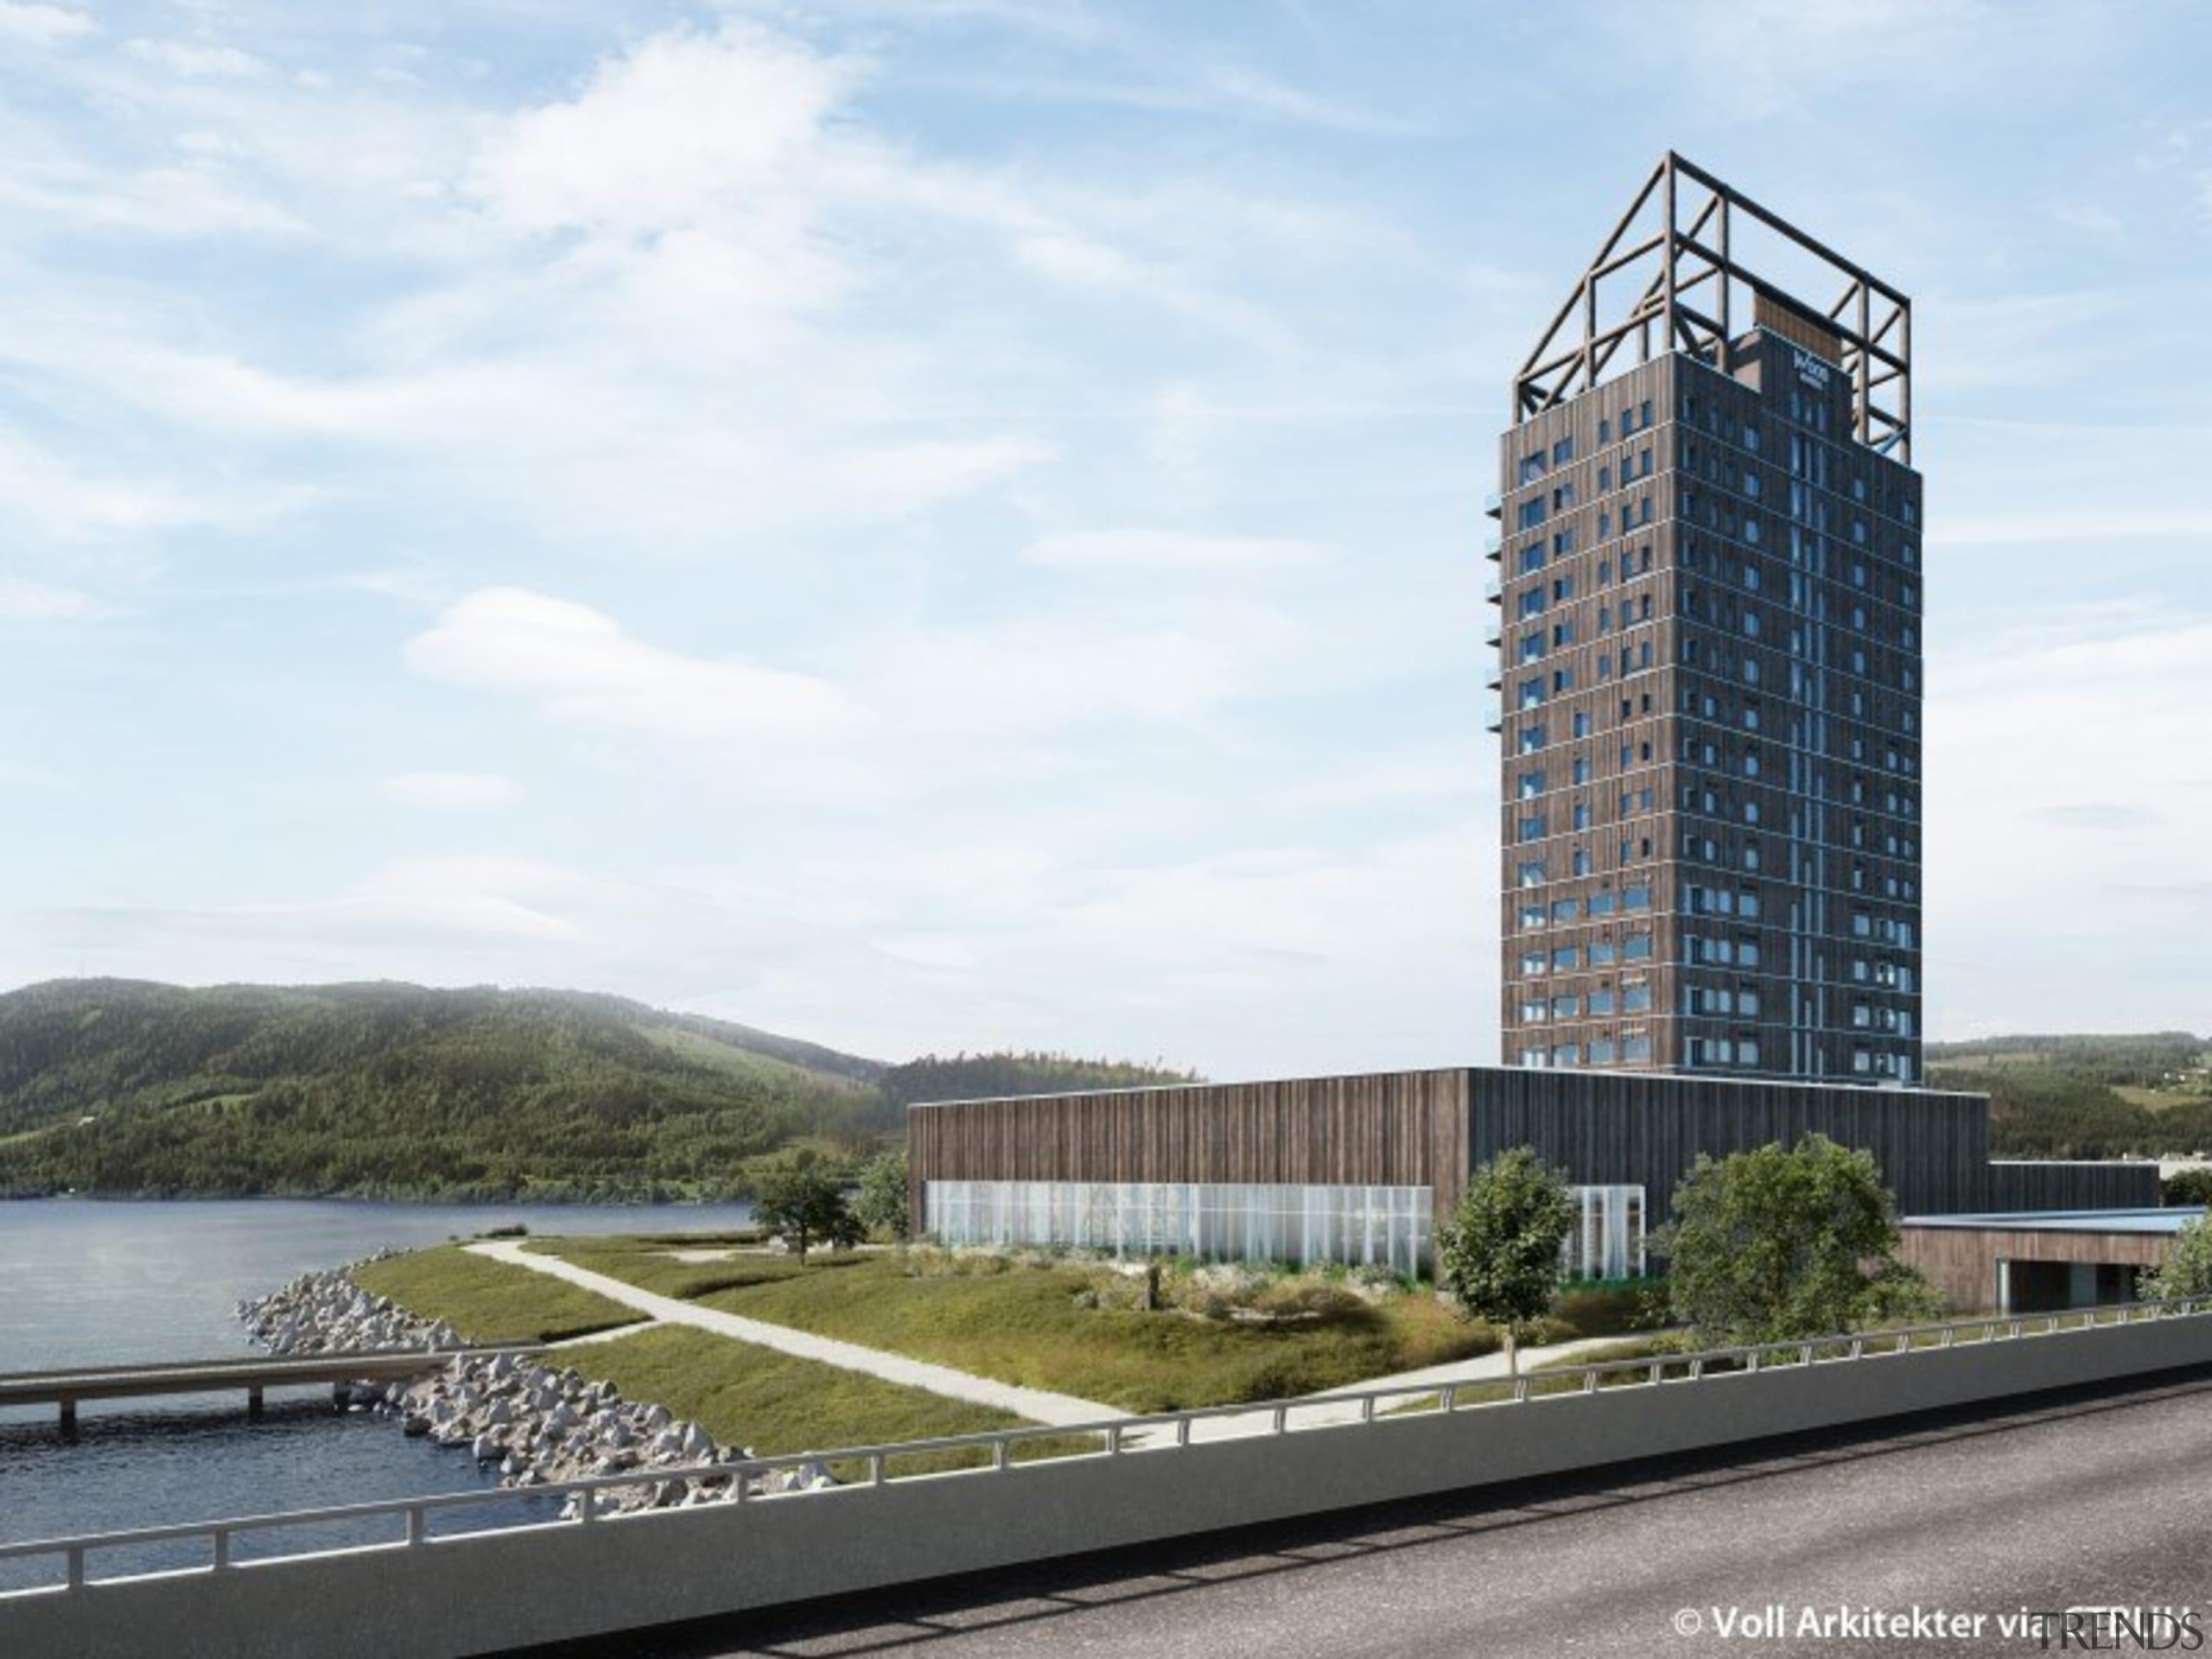 Mjøstårnet is appropriately located in an area of architecture, building, city, condominium, corporate headquarters, headquarters, landmark, metropolitan area, mixed-use, real estate, residential area, sky, skyscraper, tower, tower block, urban design, white